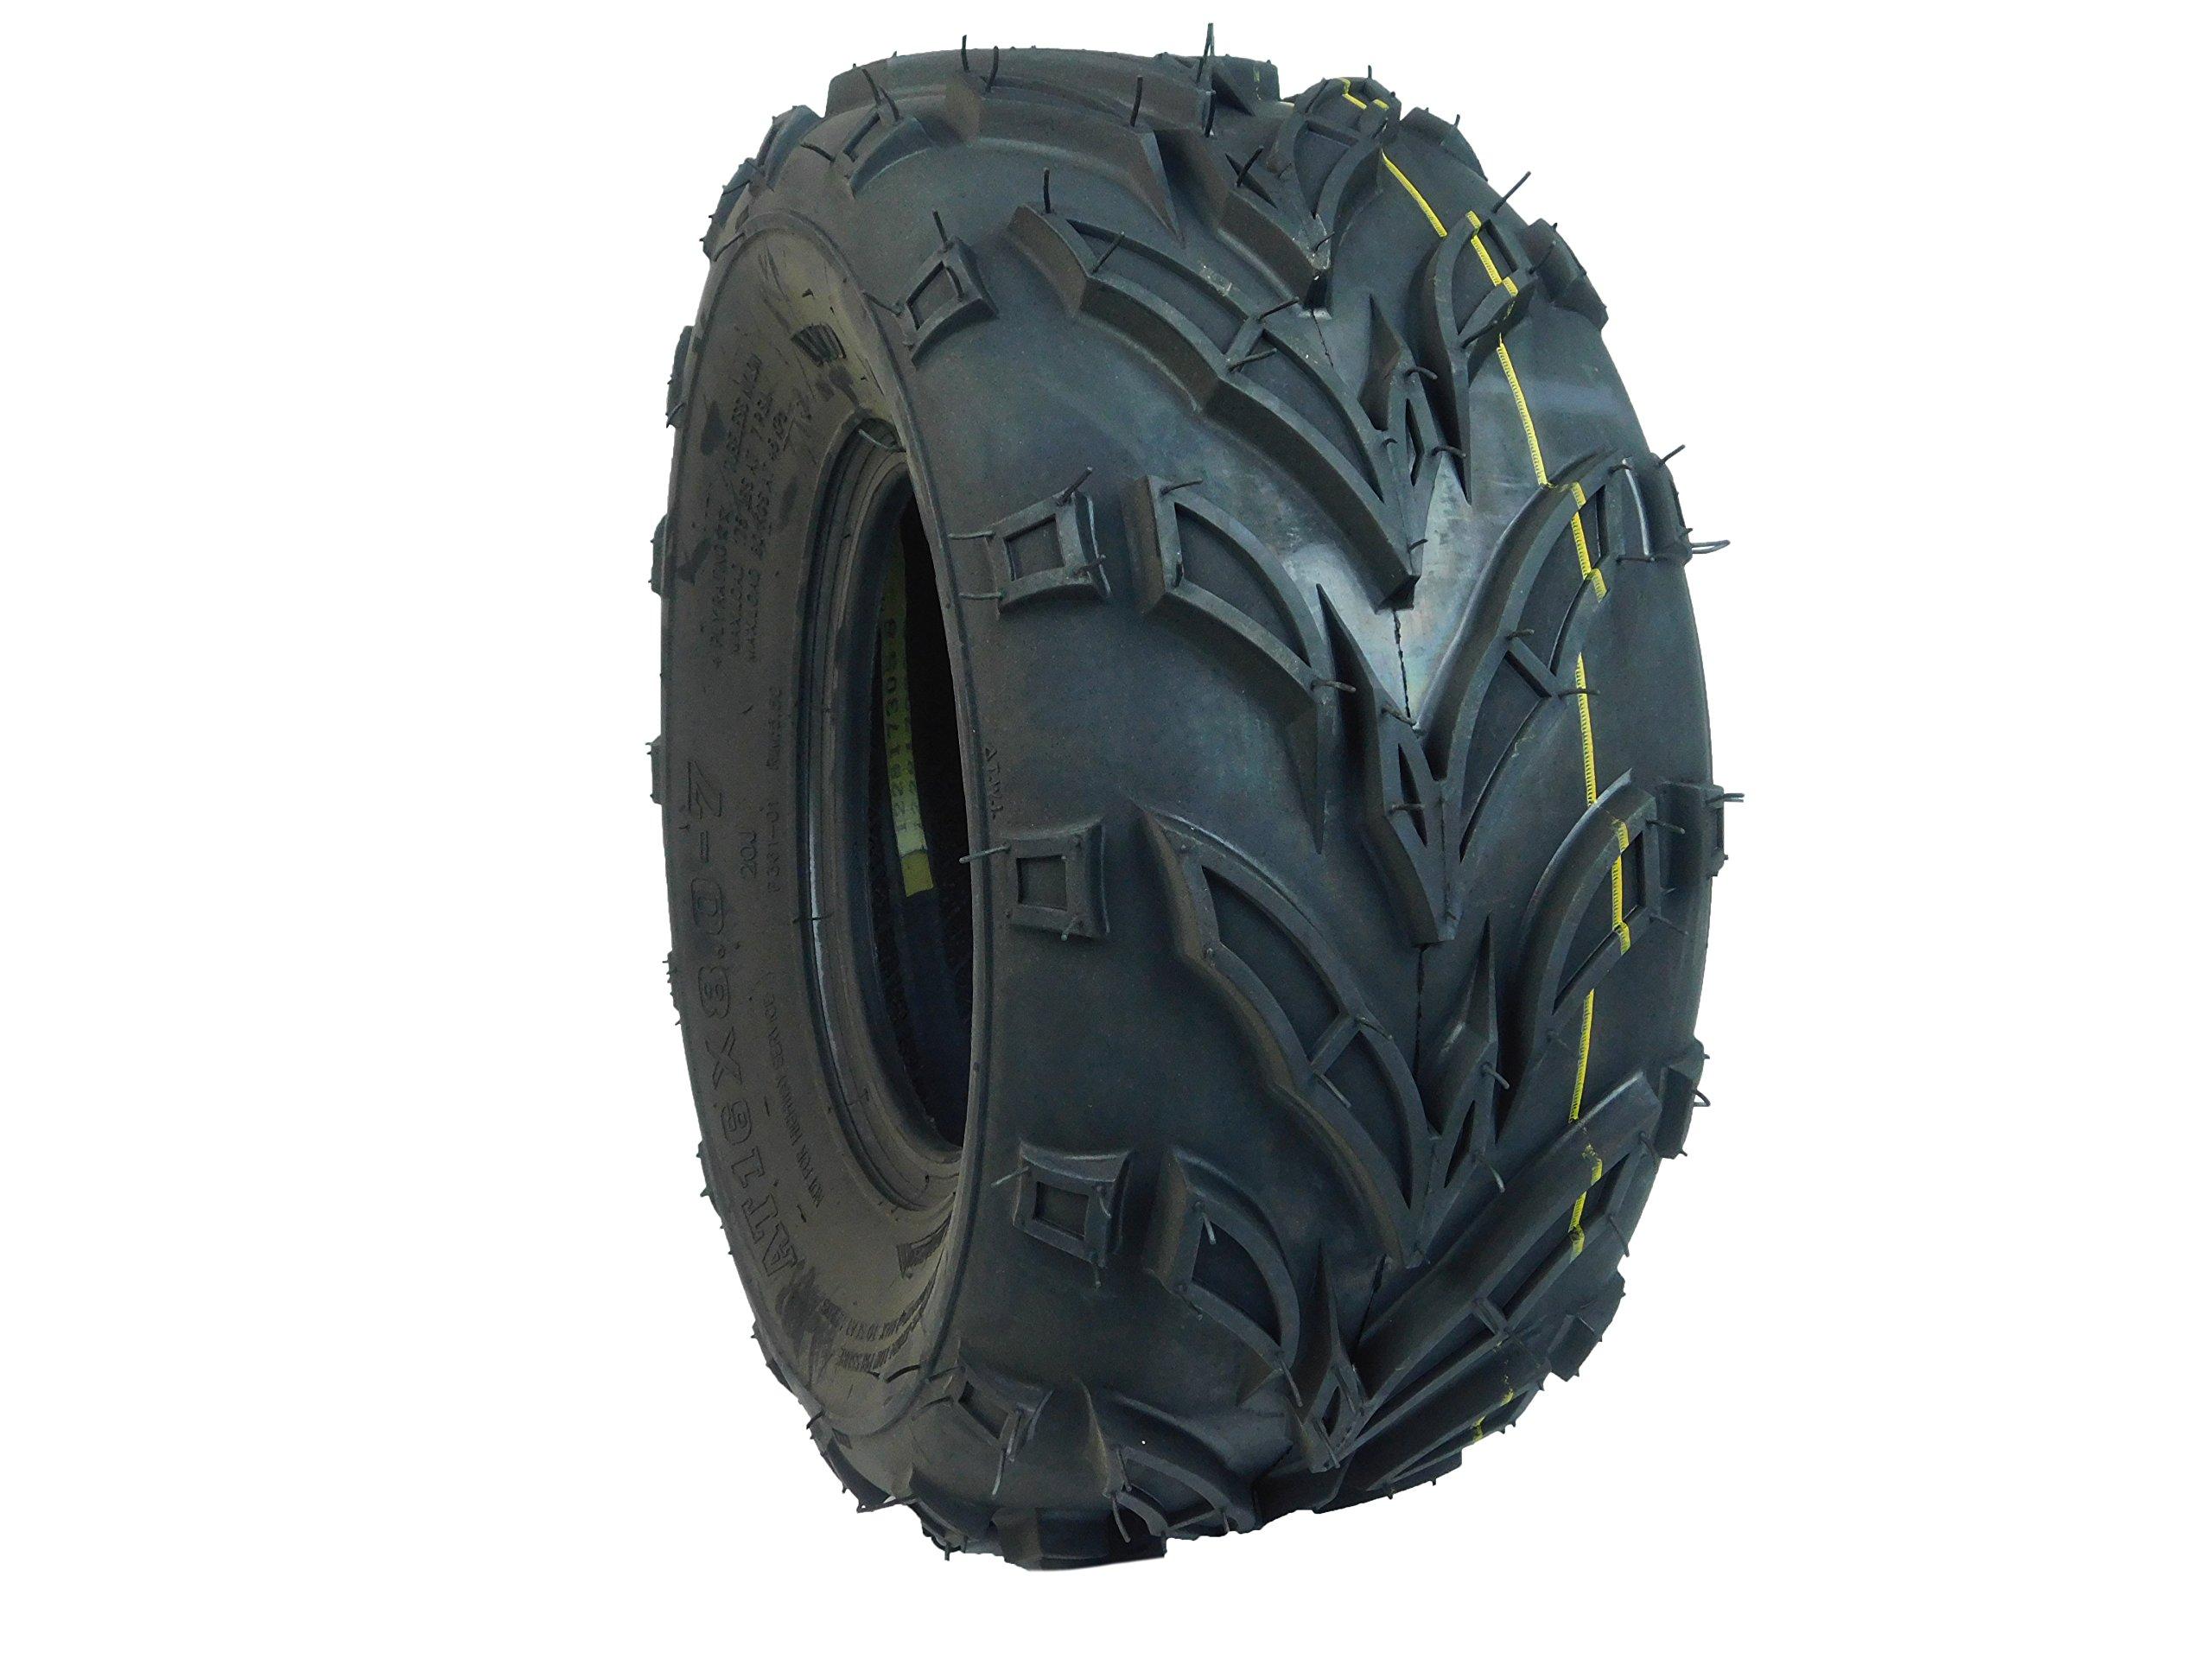 New Single 1 of 16x8.00-7 MASSFX ATV /ATC Tire 16x8-7 16/8-7 16x8x7 MO1687